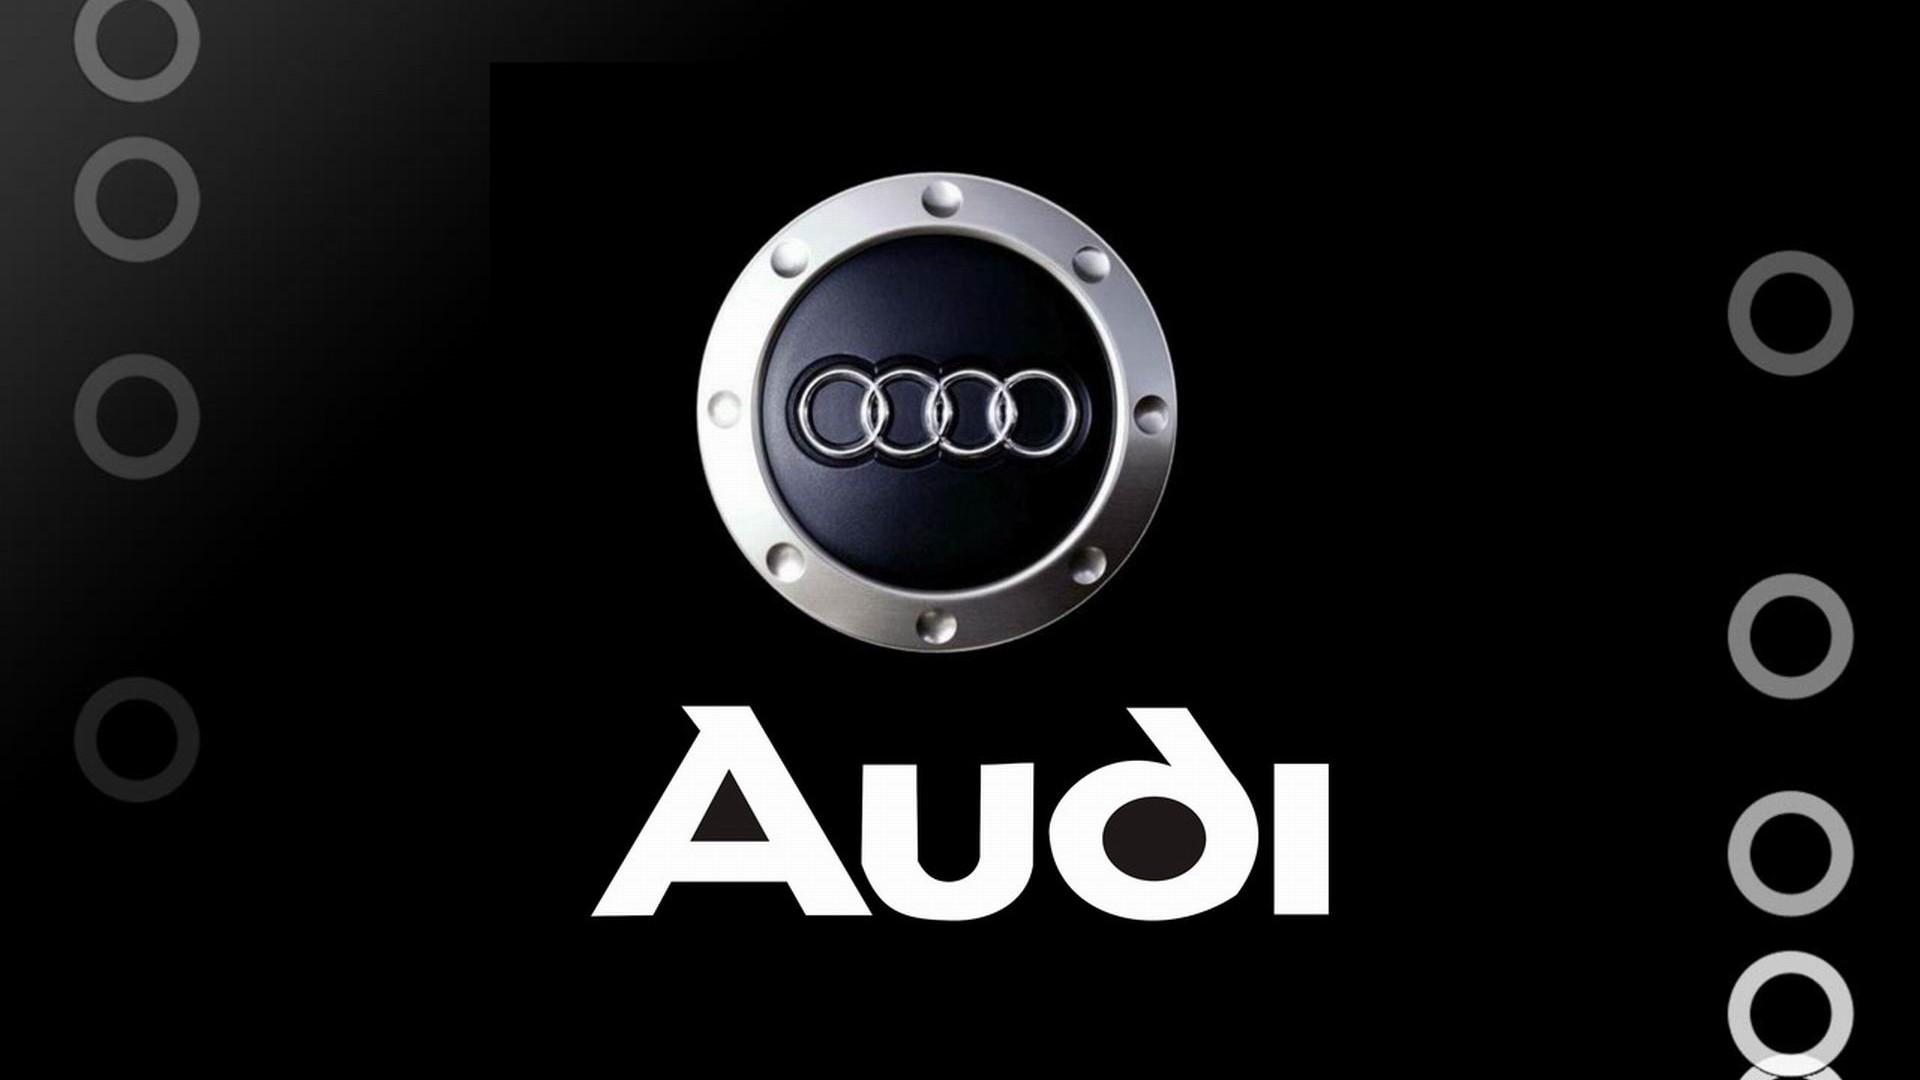 Audi Brand Logo Design Background HD Wallpaper 961 Wallpaper 1920x1080